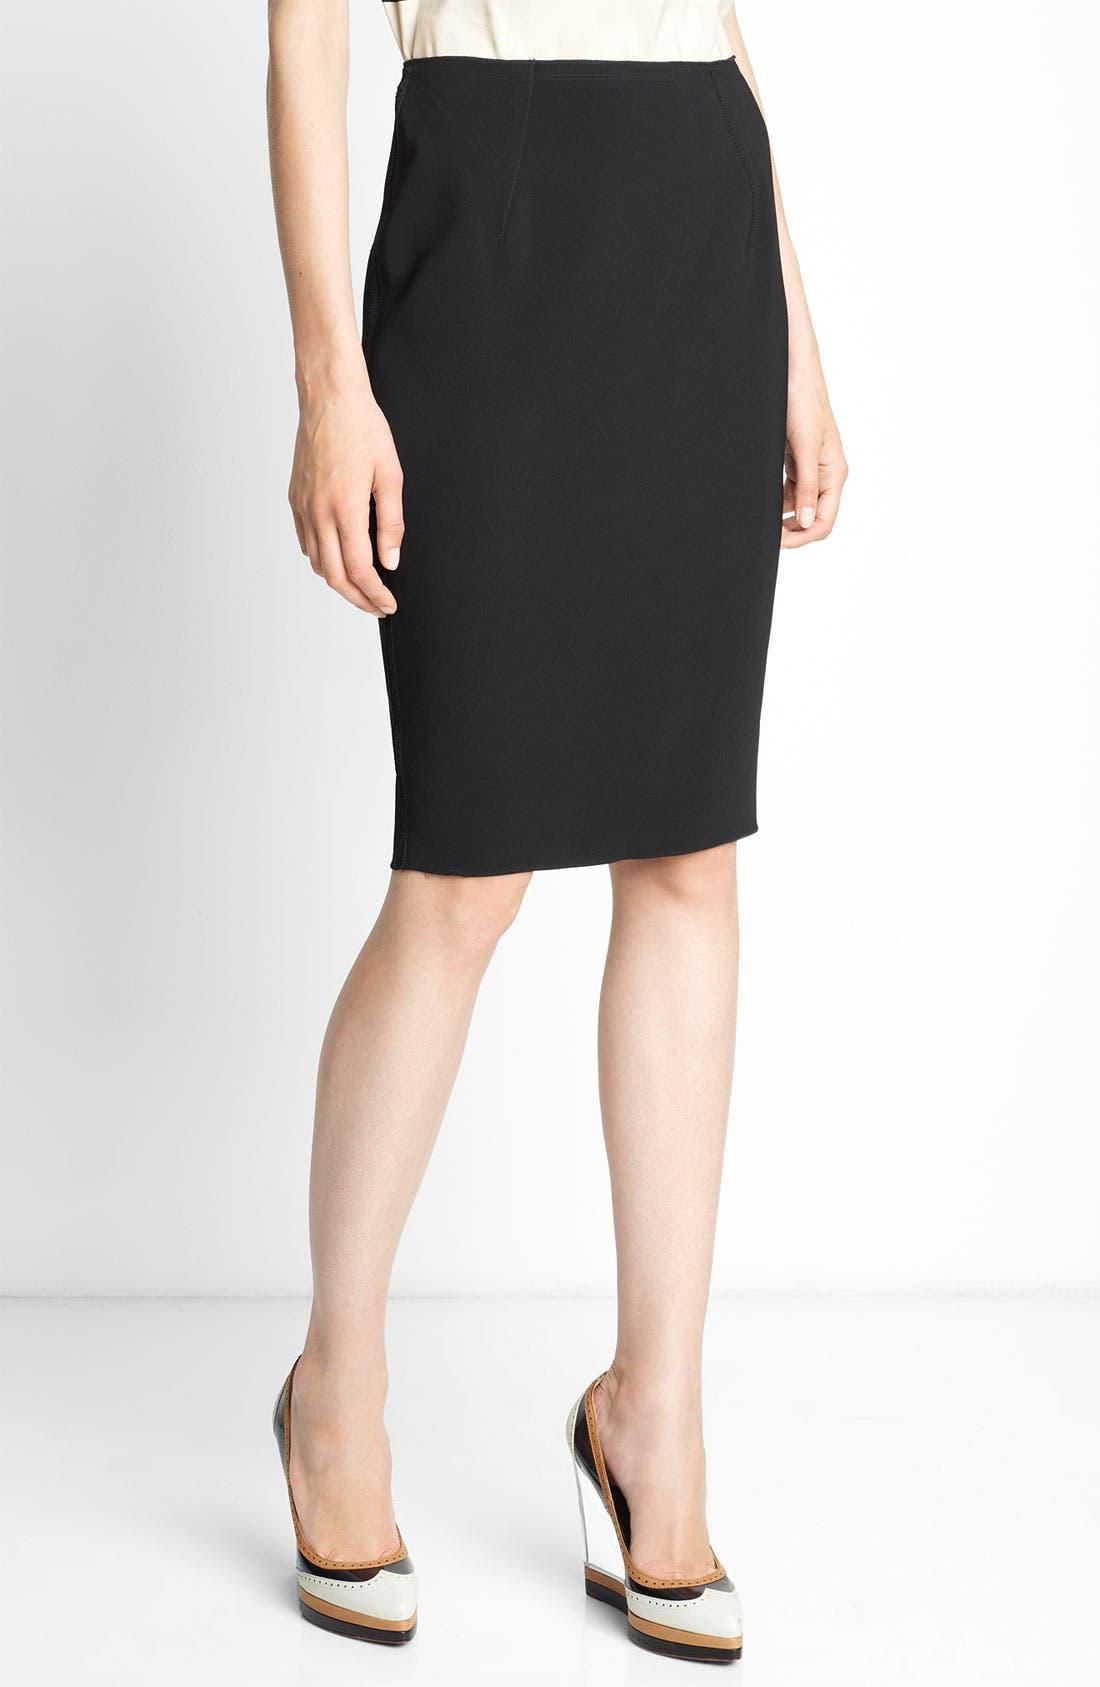 Alternate Image 1 Selected - Lanvin Grosgrain Inset Crepe Skirt